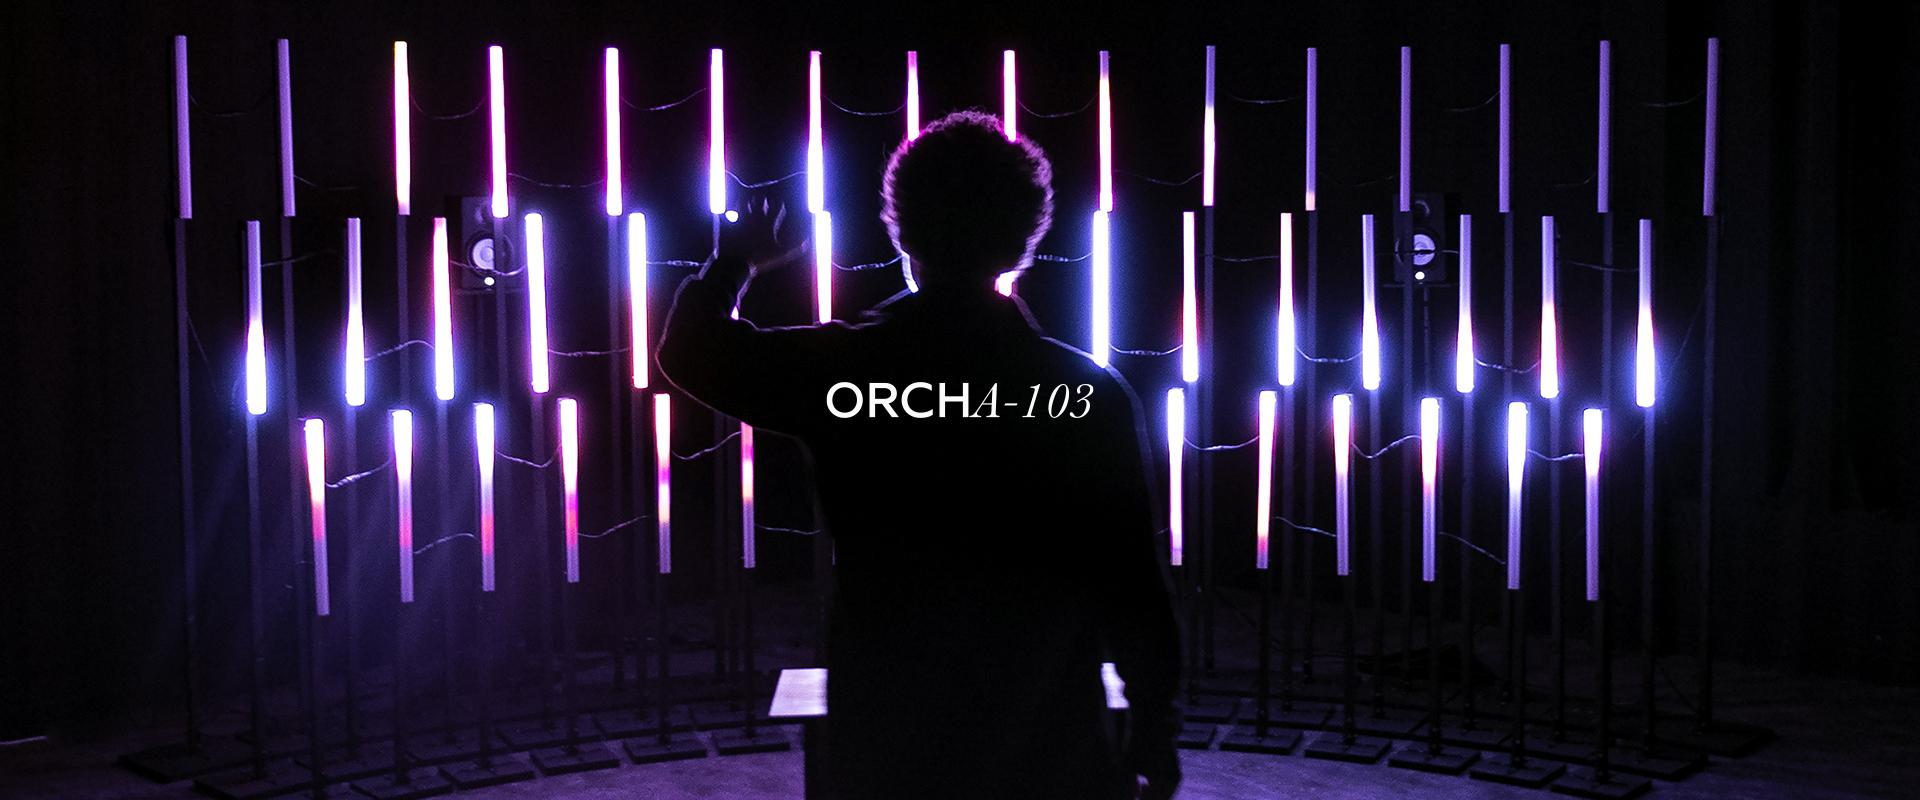 ORCHA-103 - Teaser